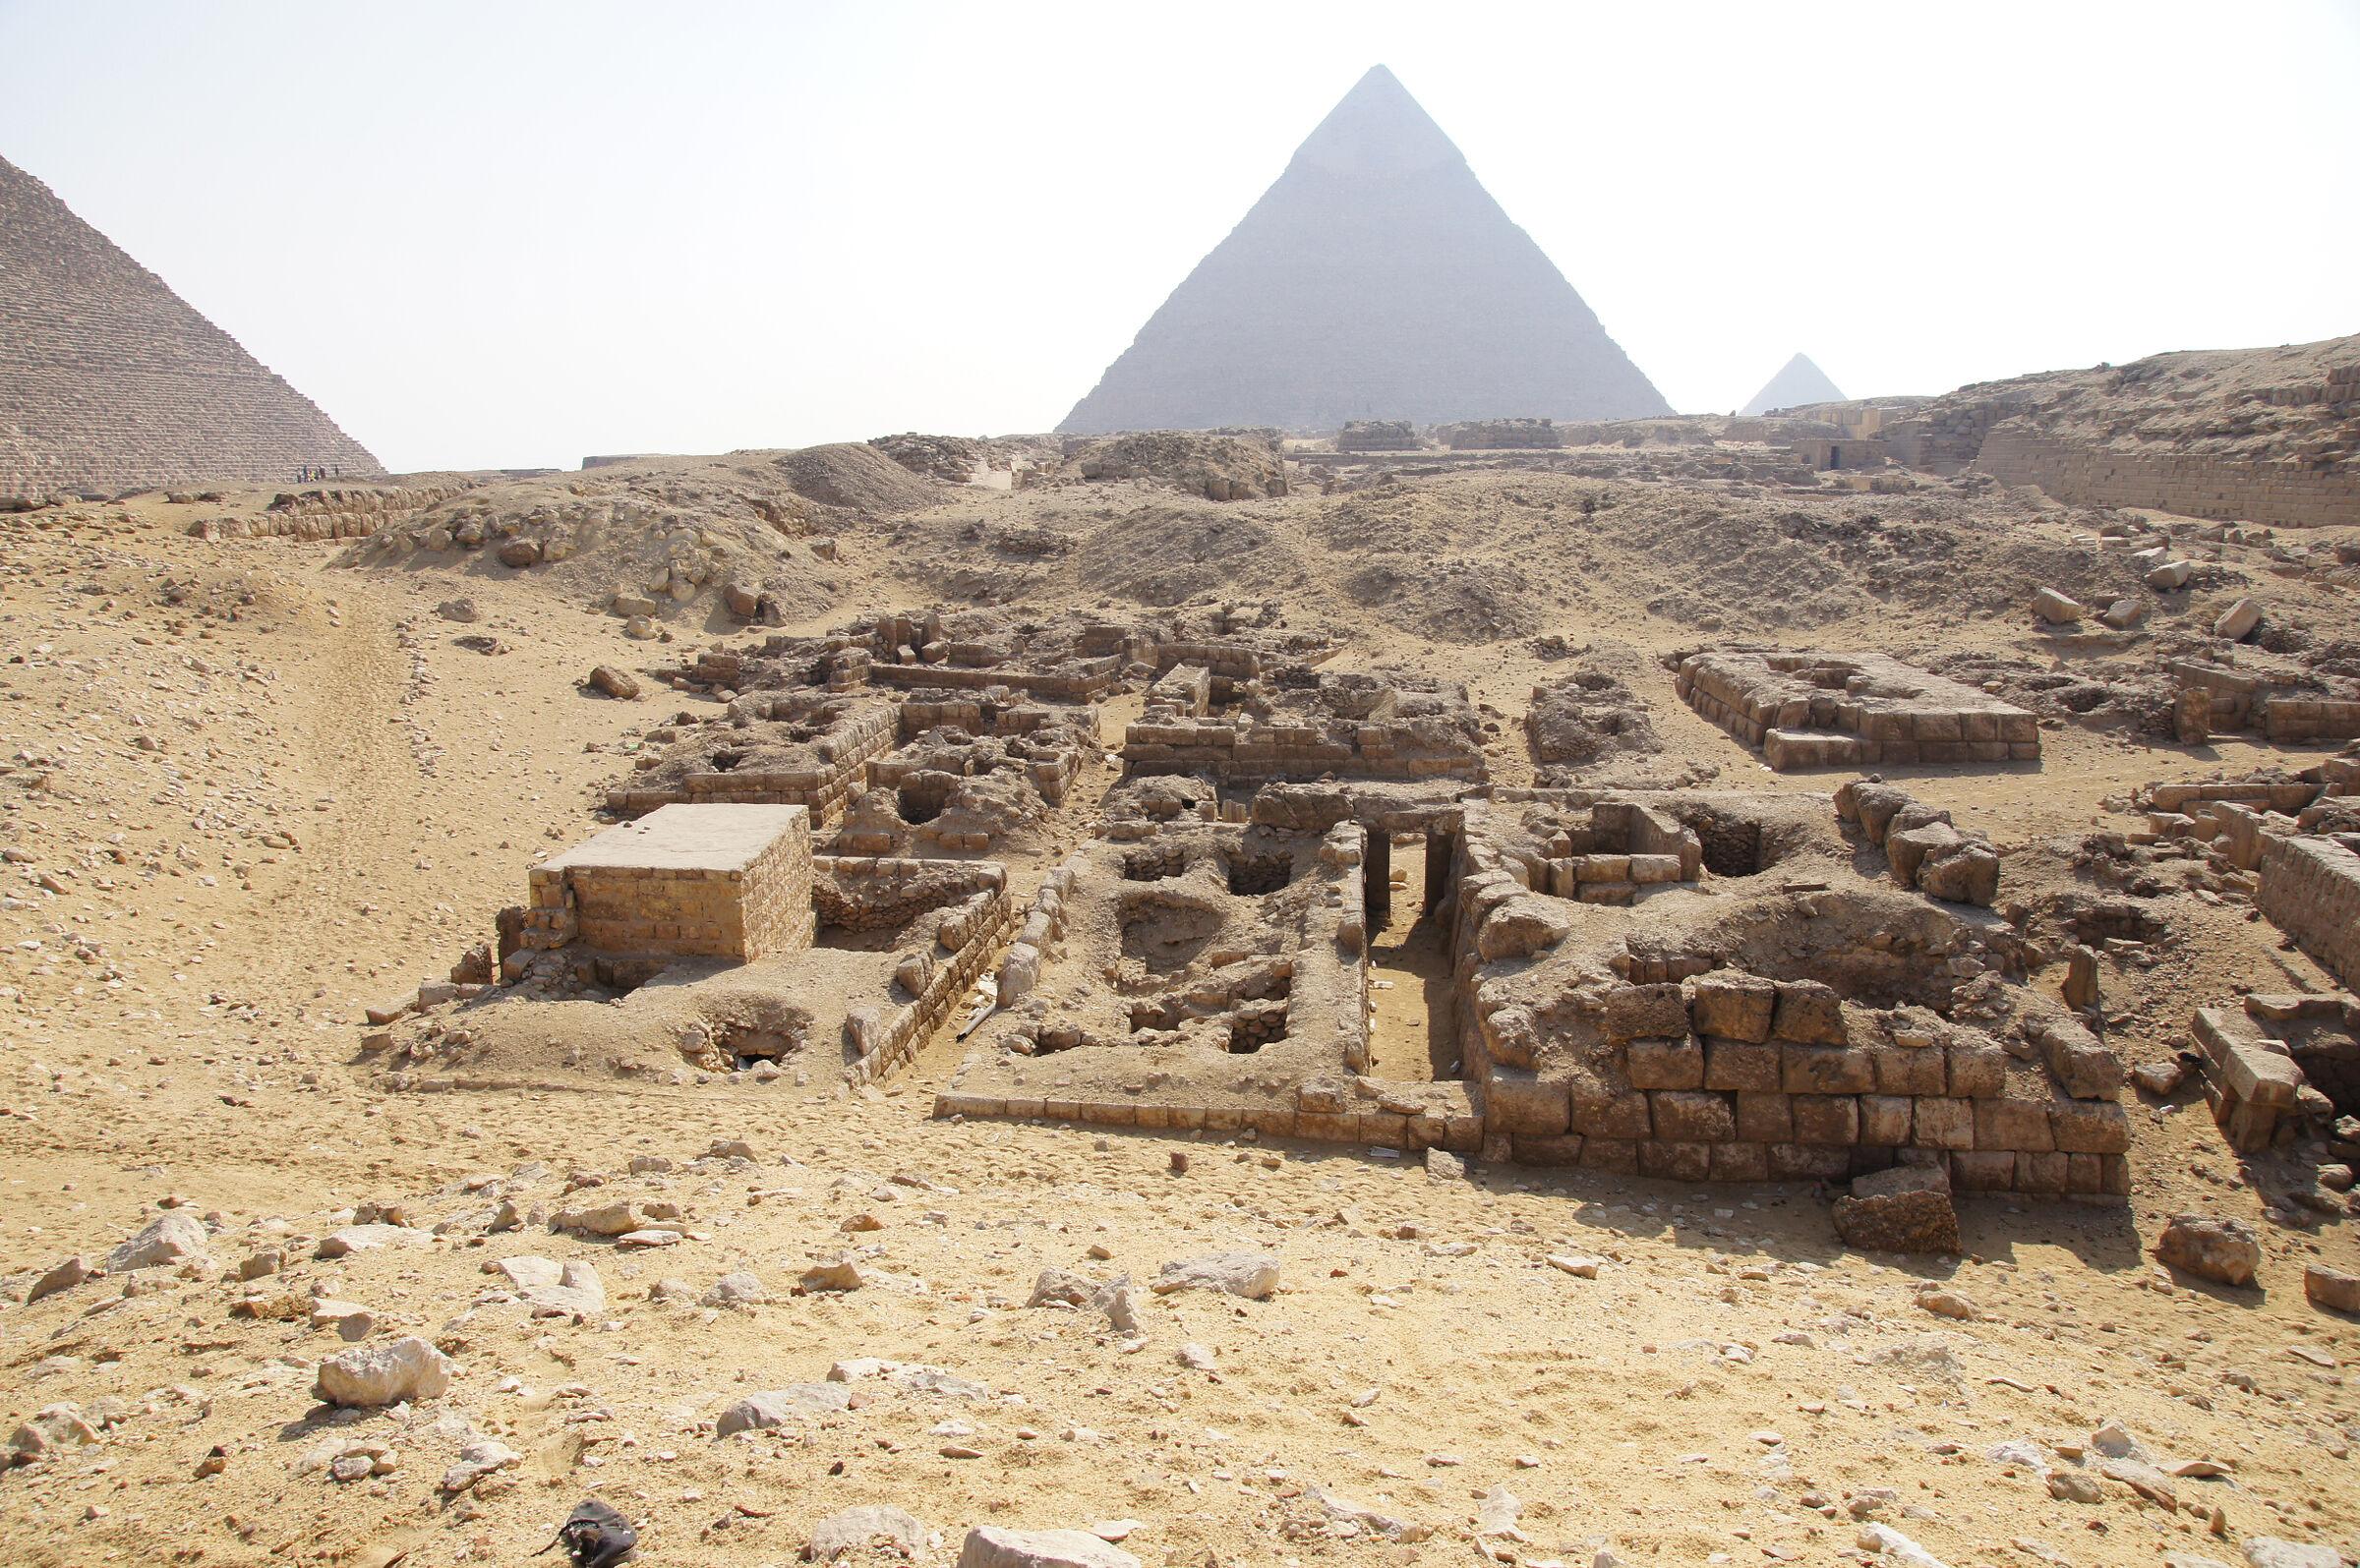 Western Cemetery: Site: Giza; View: G 2240, G 2230+2231, G 2084, G 2085, G 2086, G 2243, G 2244, G 2245, G 2239, G 2238, G 2242, G 2241, G 2237, G 2232, G 2233, G 2234, G 2235, G 2236, G 2071, G 2061, G 2072, G 2074, G 2073